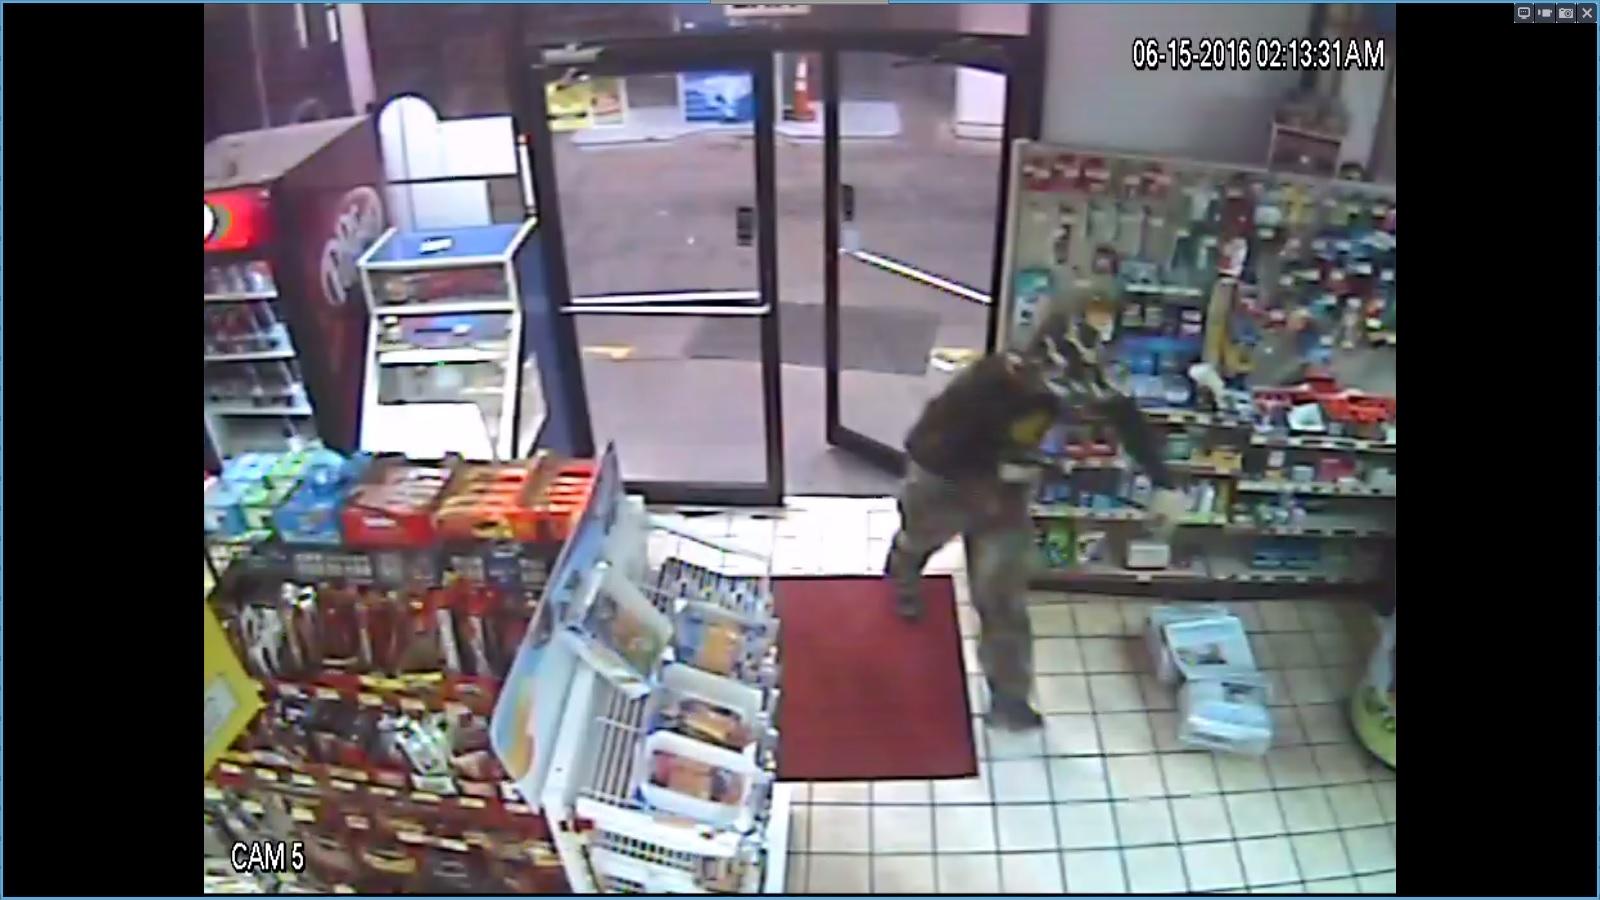 Clarksville Camo Suspect Entering